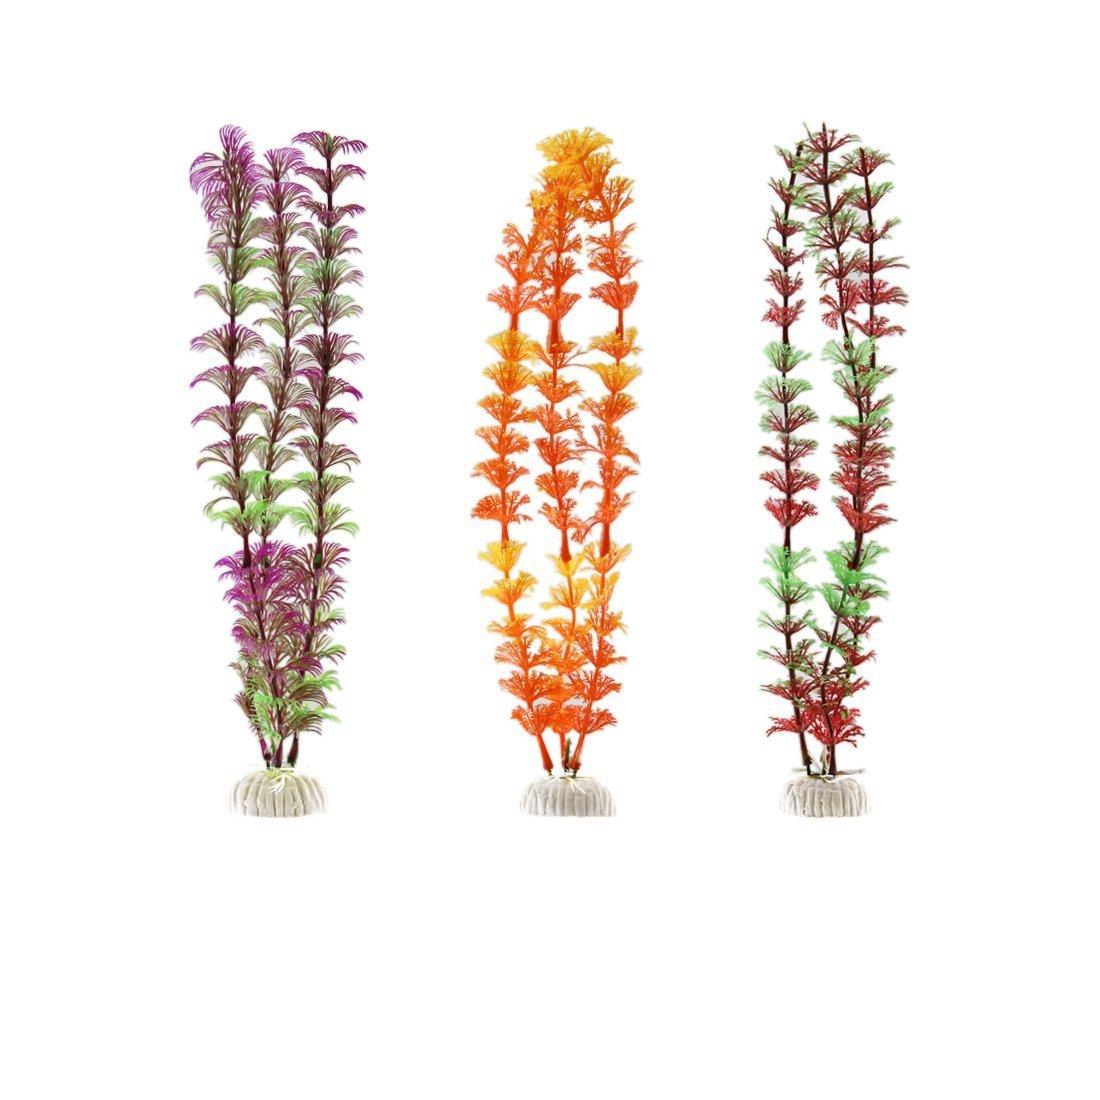 1Pc Plastic Fish Tank Aquarium Artificial Plant Grass Ornament Landce Tricolor